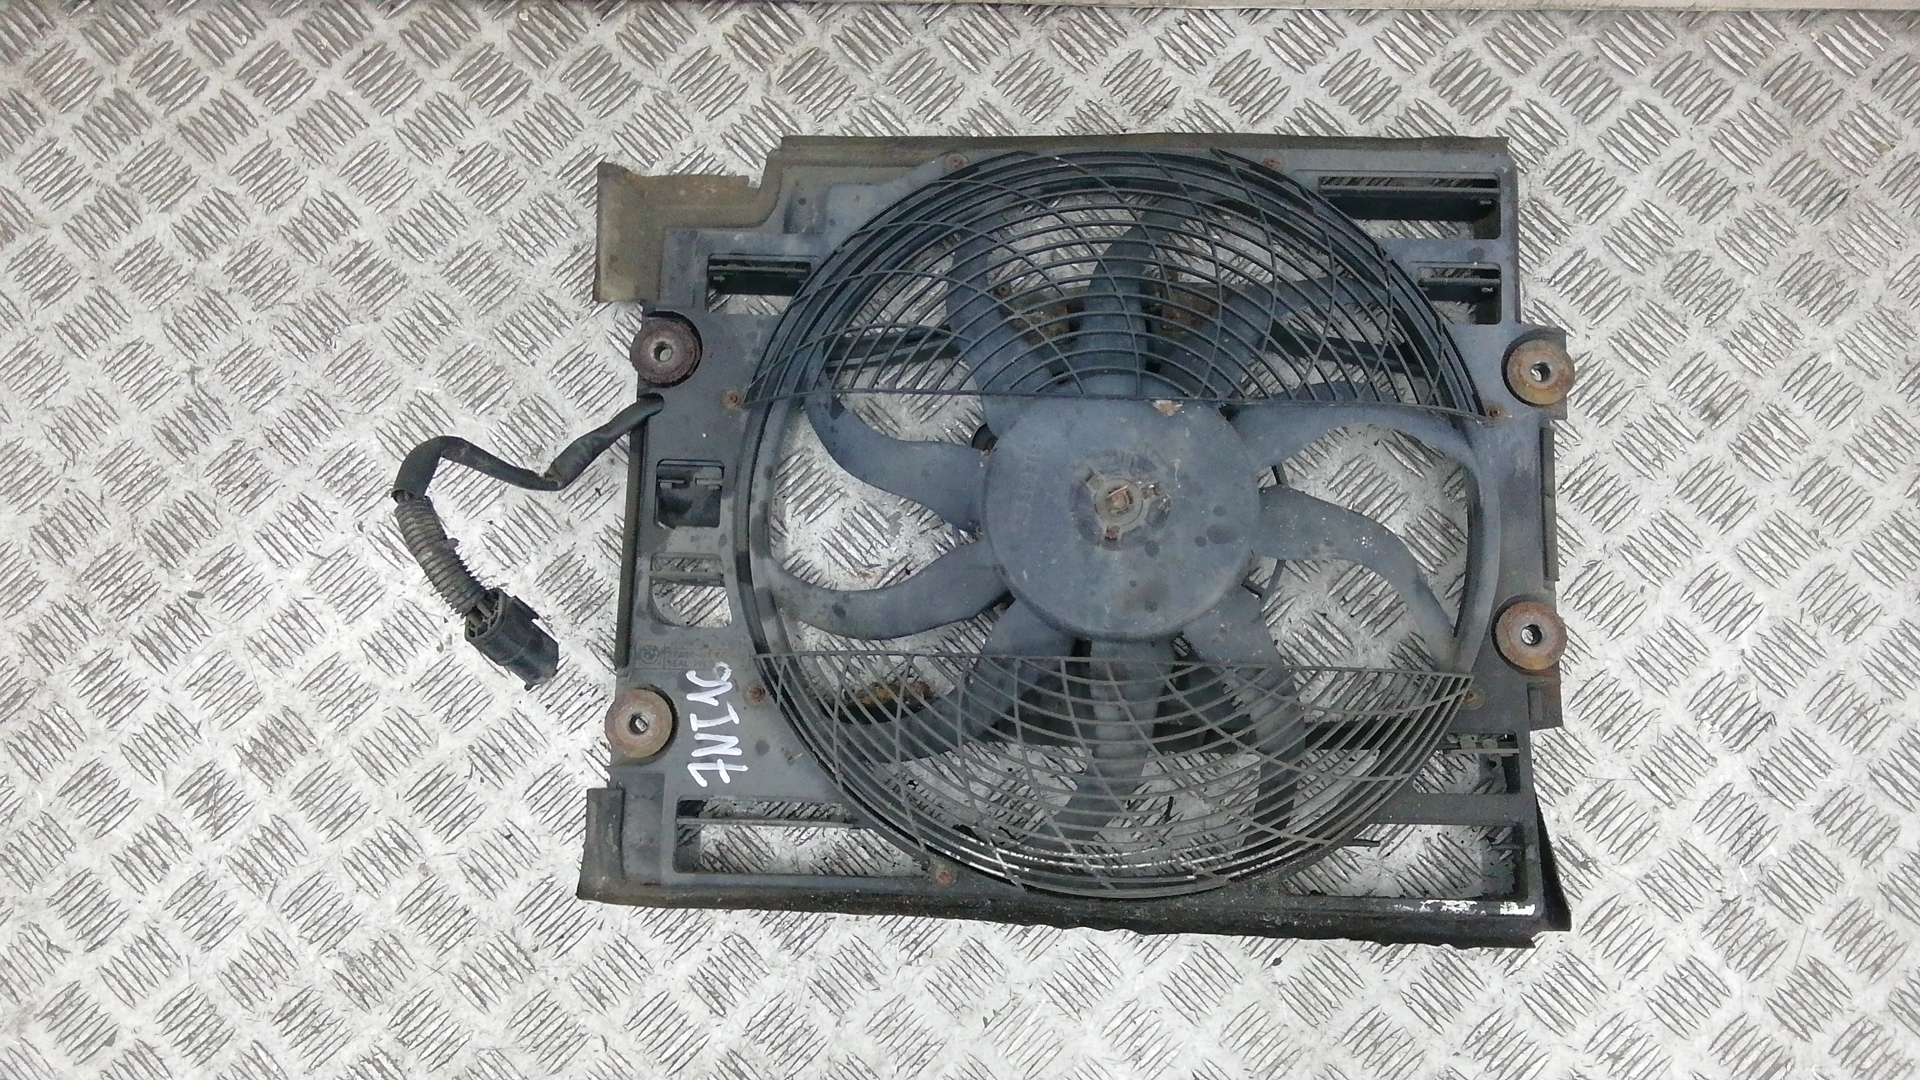 Вентилятор радиатора, BMW, 5 E39, 1997